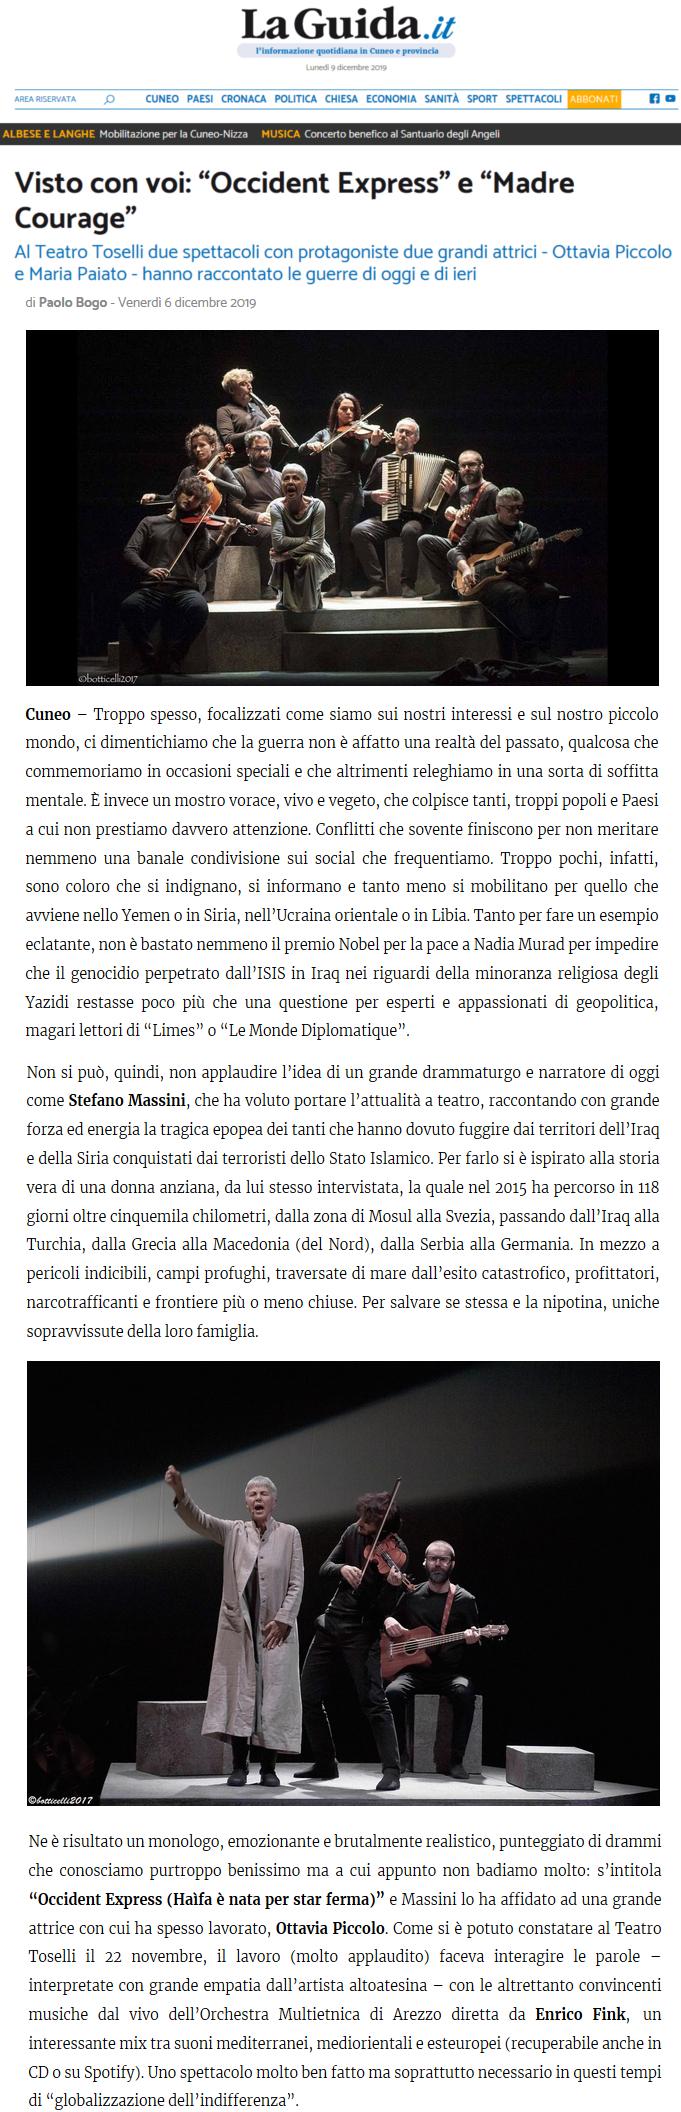 191206-la-guida-it